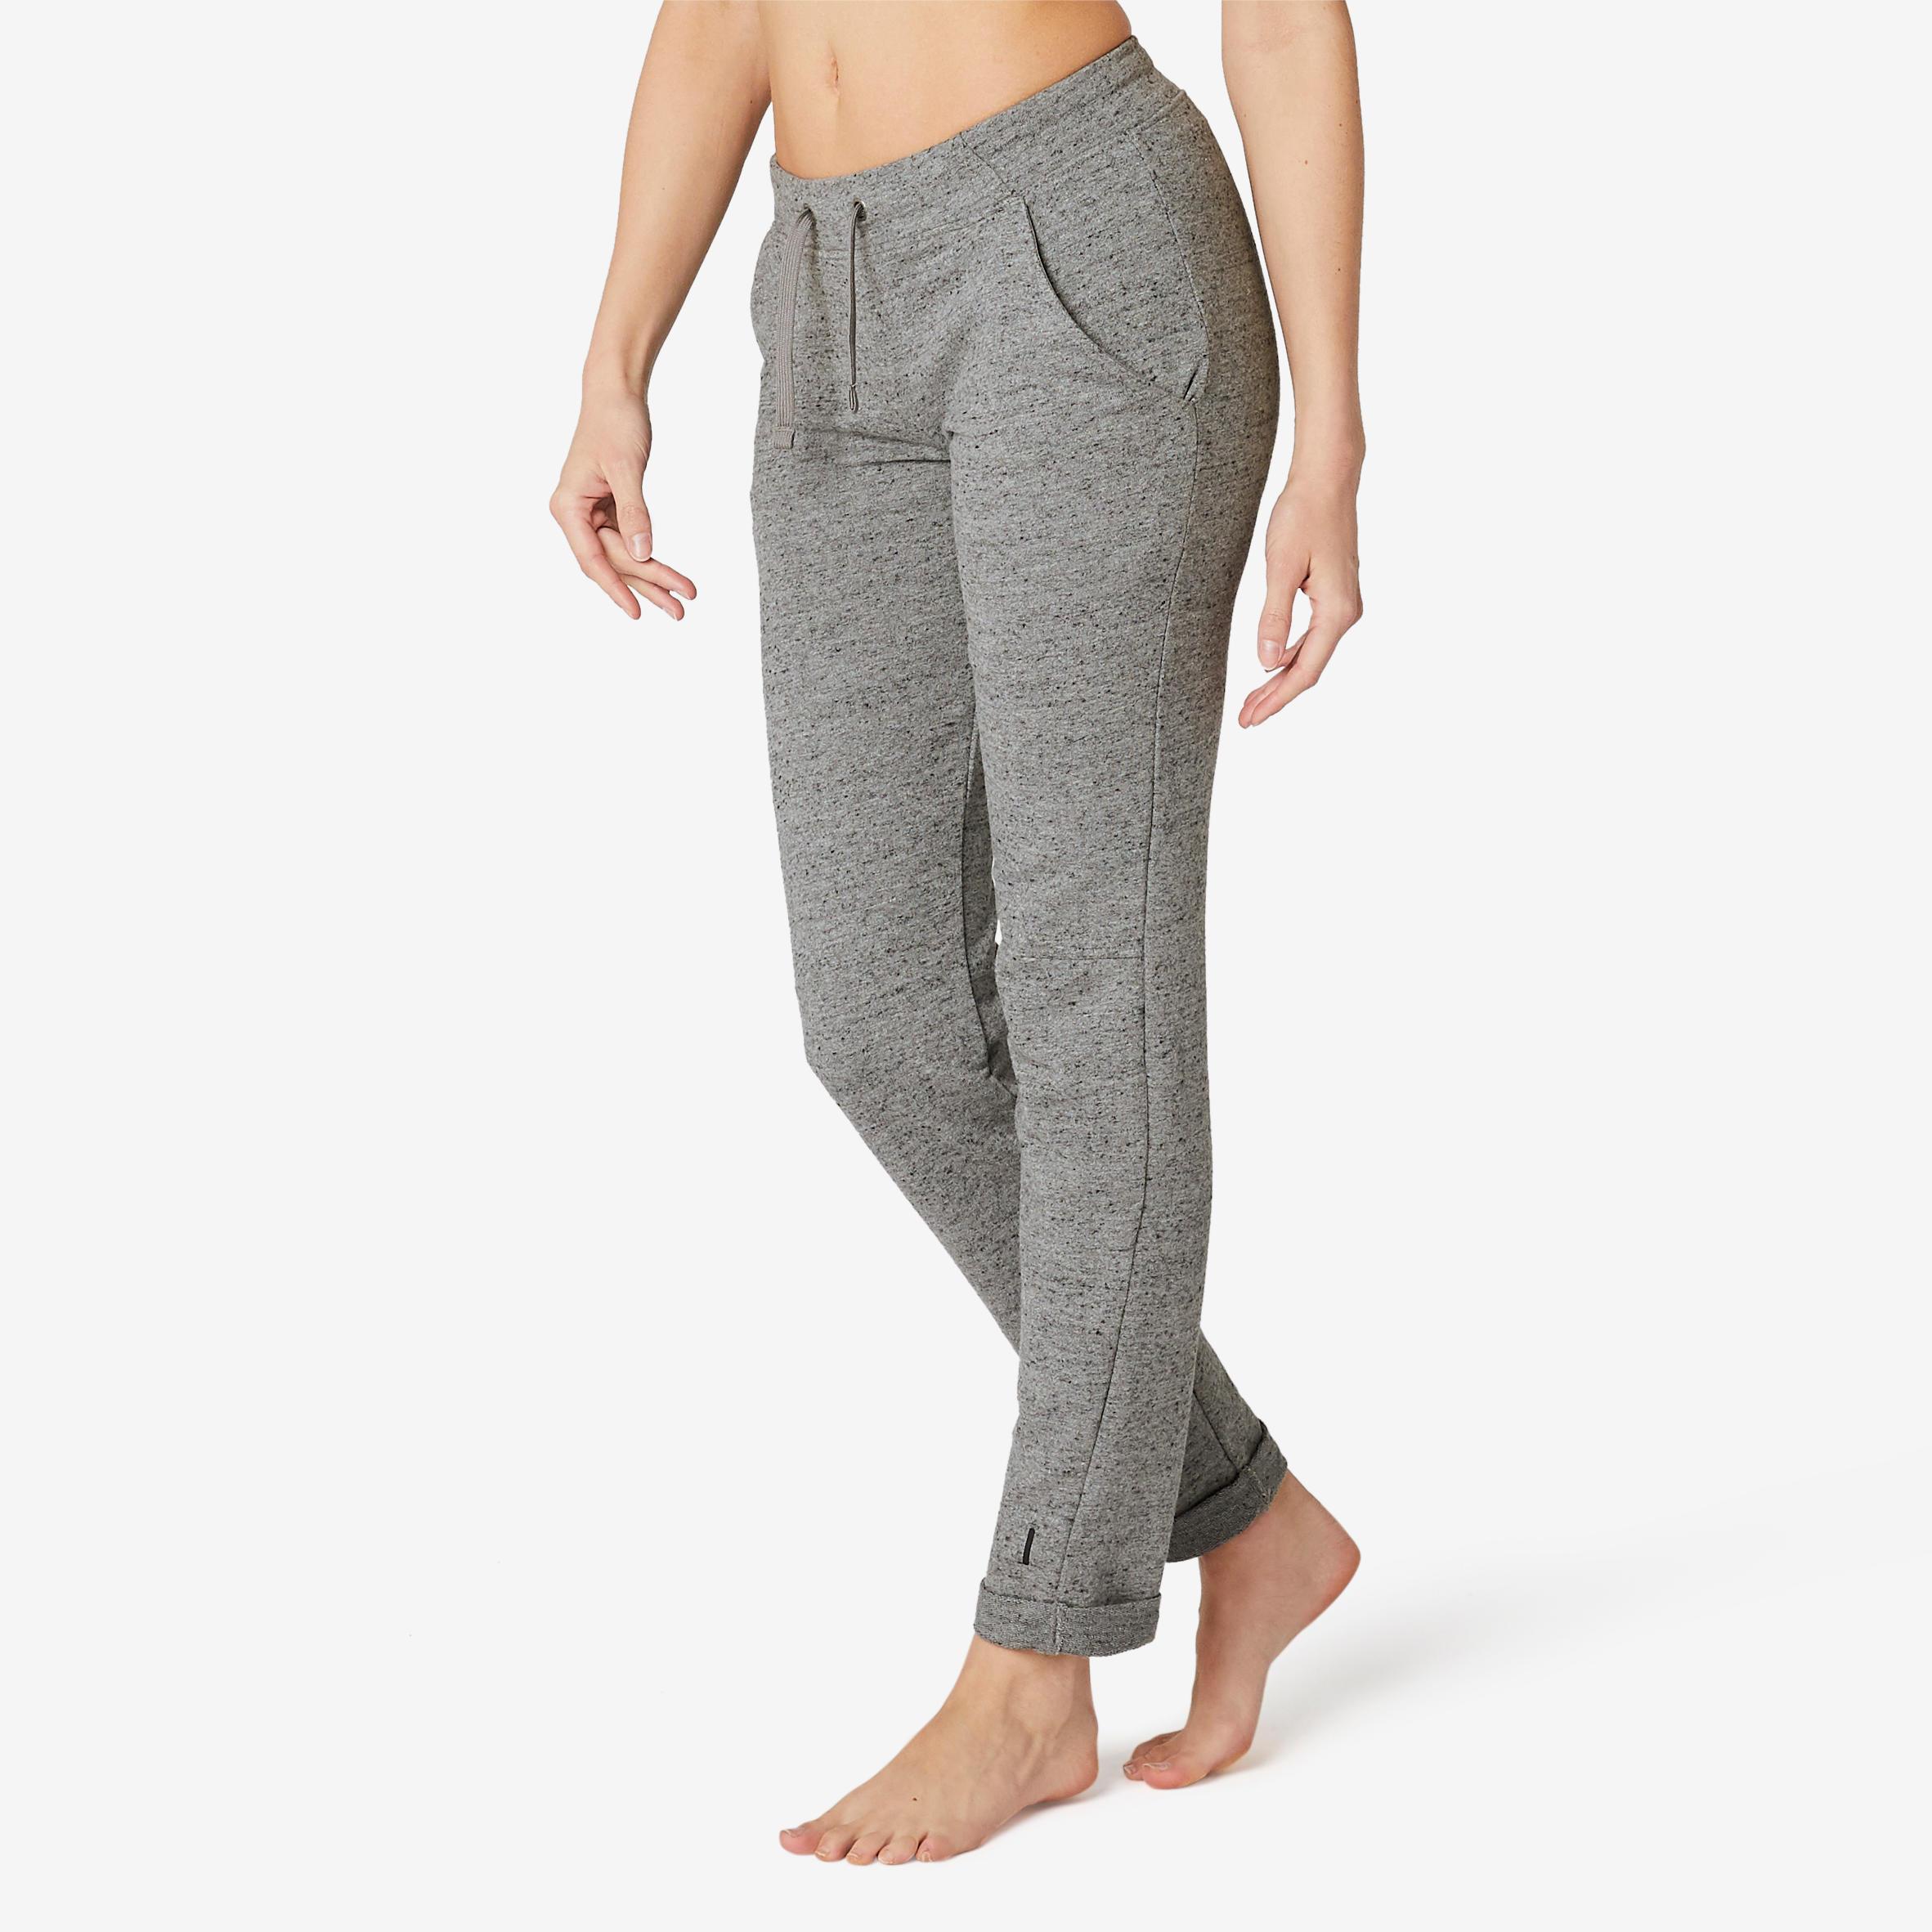 Pantalon Slim 500 negru damă la Reducere poza